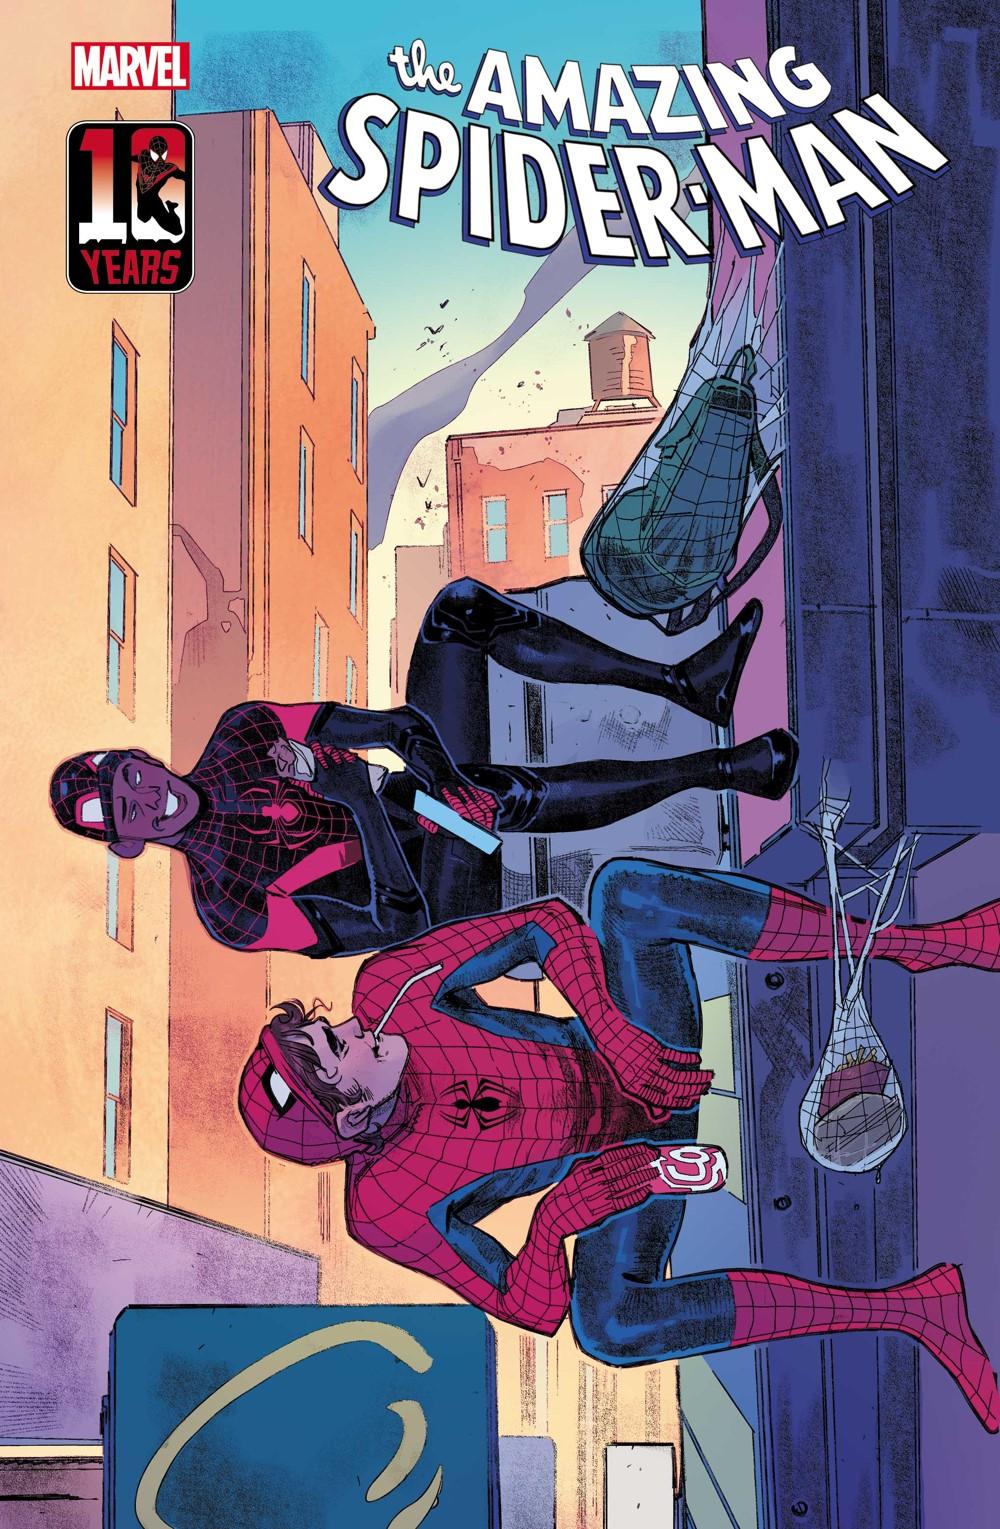 ASM2018074_Pichelli_Miles_VAR Marvel Comics September 2021 Solicitations